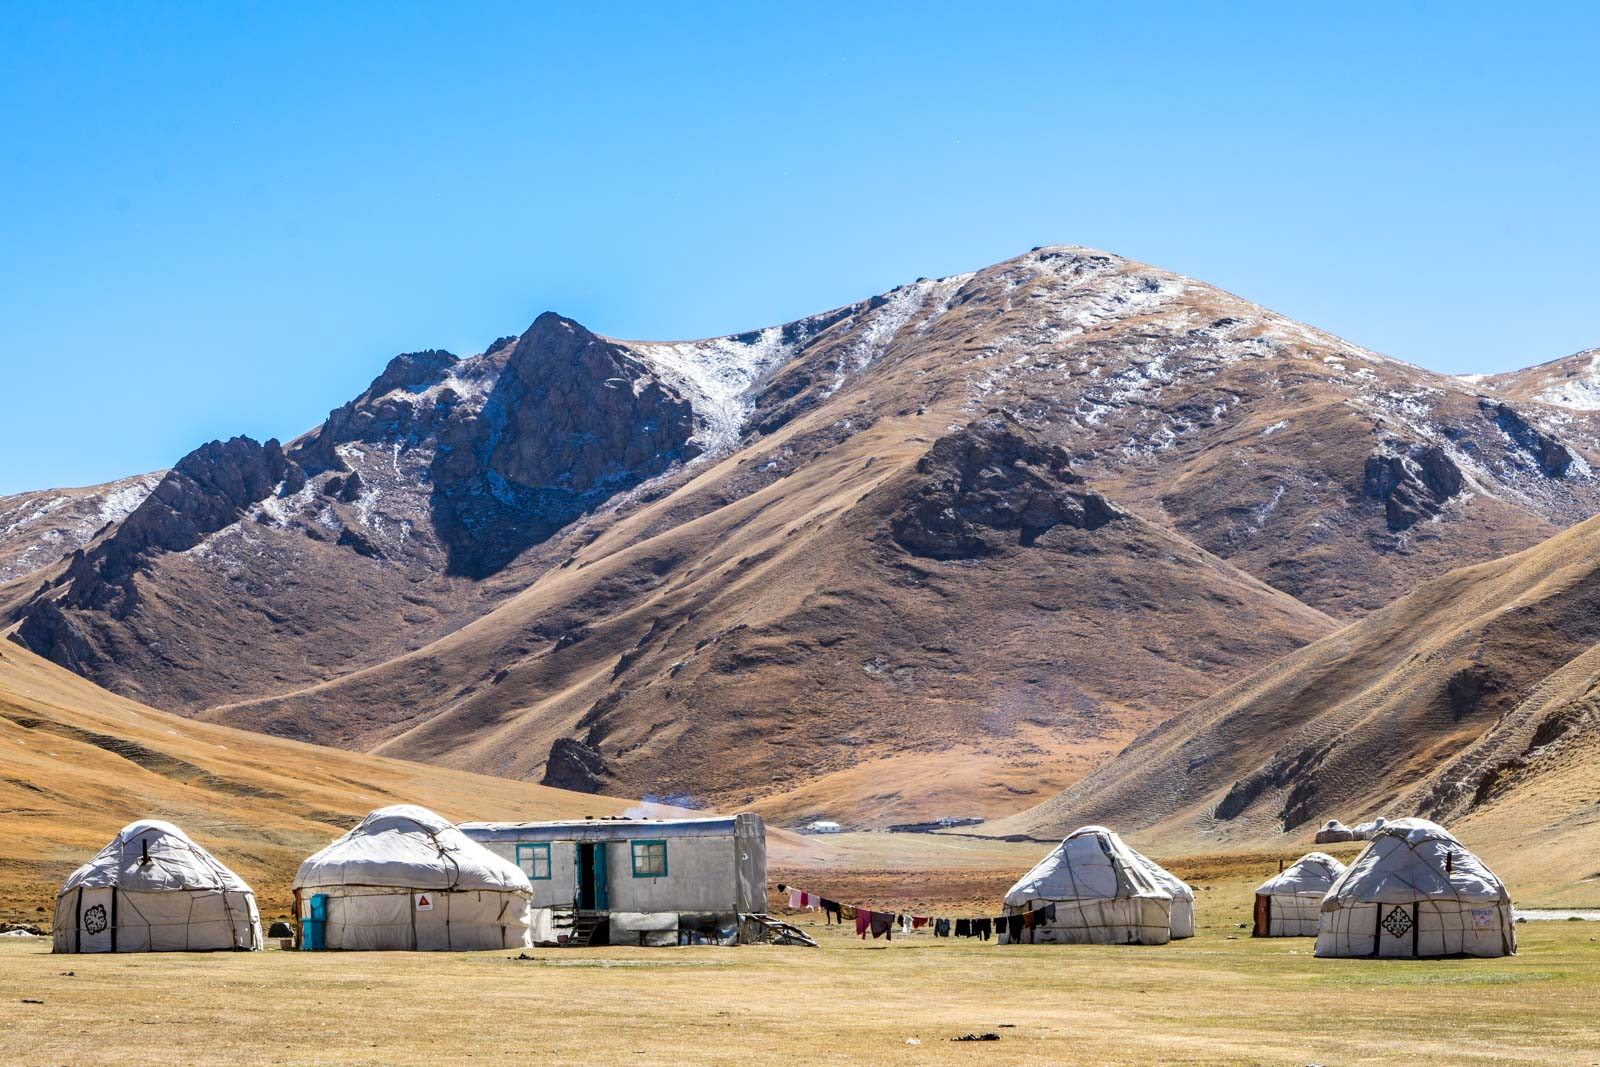 Tash Rabat caravanserai, Kyrgyzstan